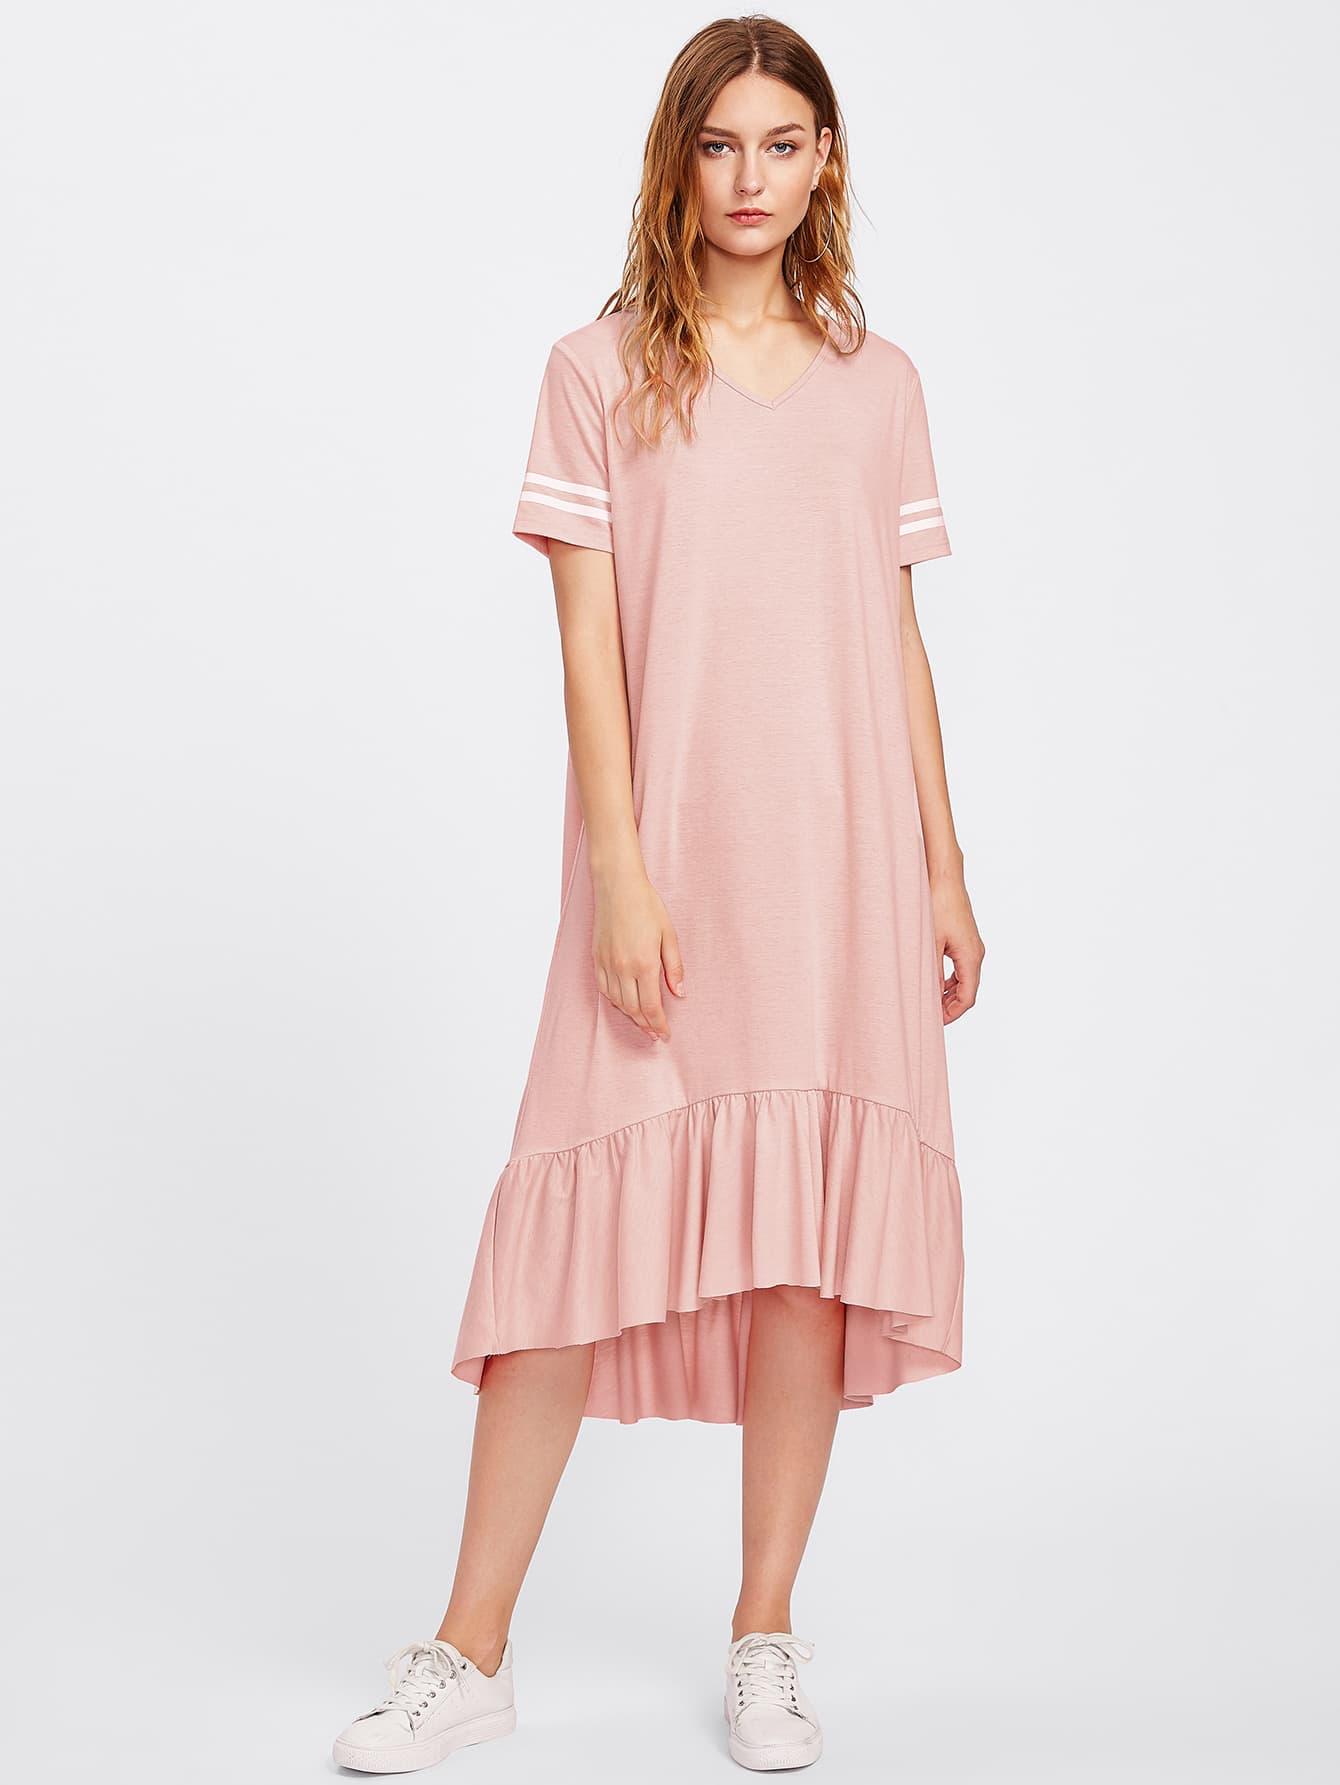 Striped Sleeve Flounce Hem Heathered Tee Dress flounce sleeve striped denim dress